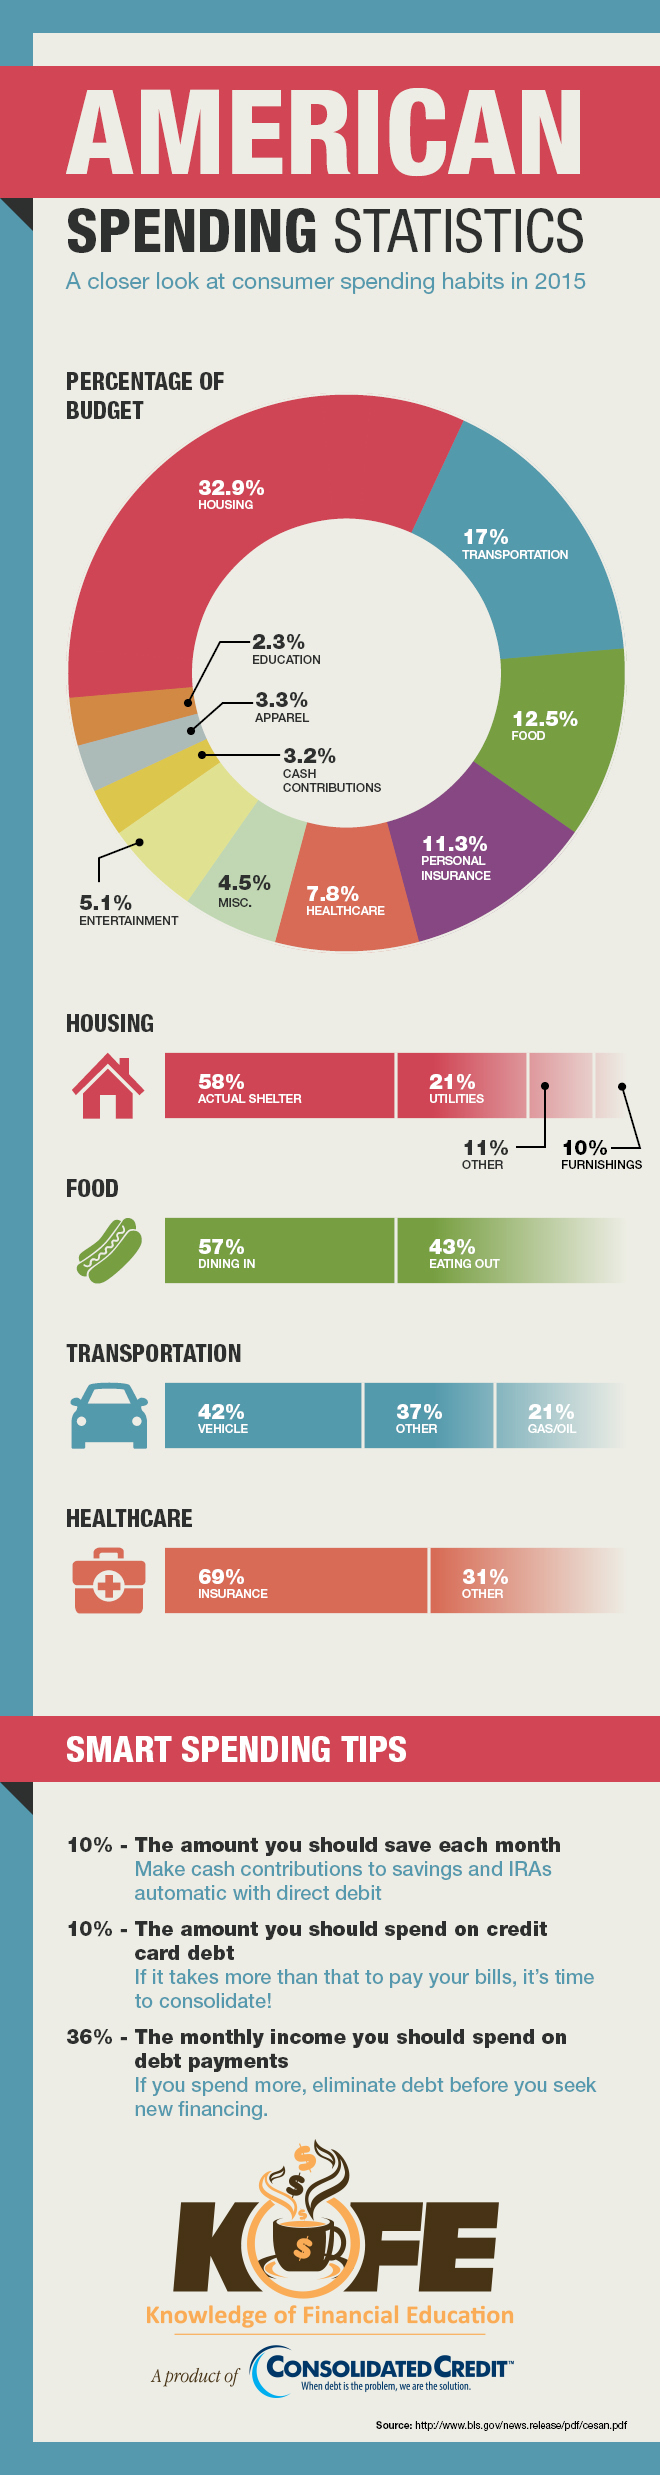 america spending statistics infographic